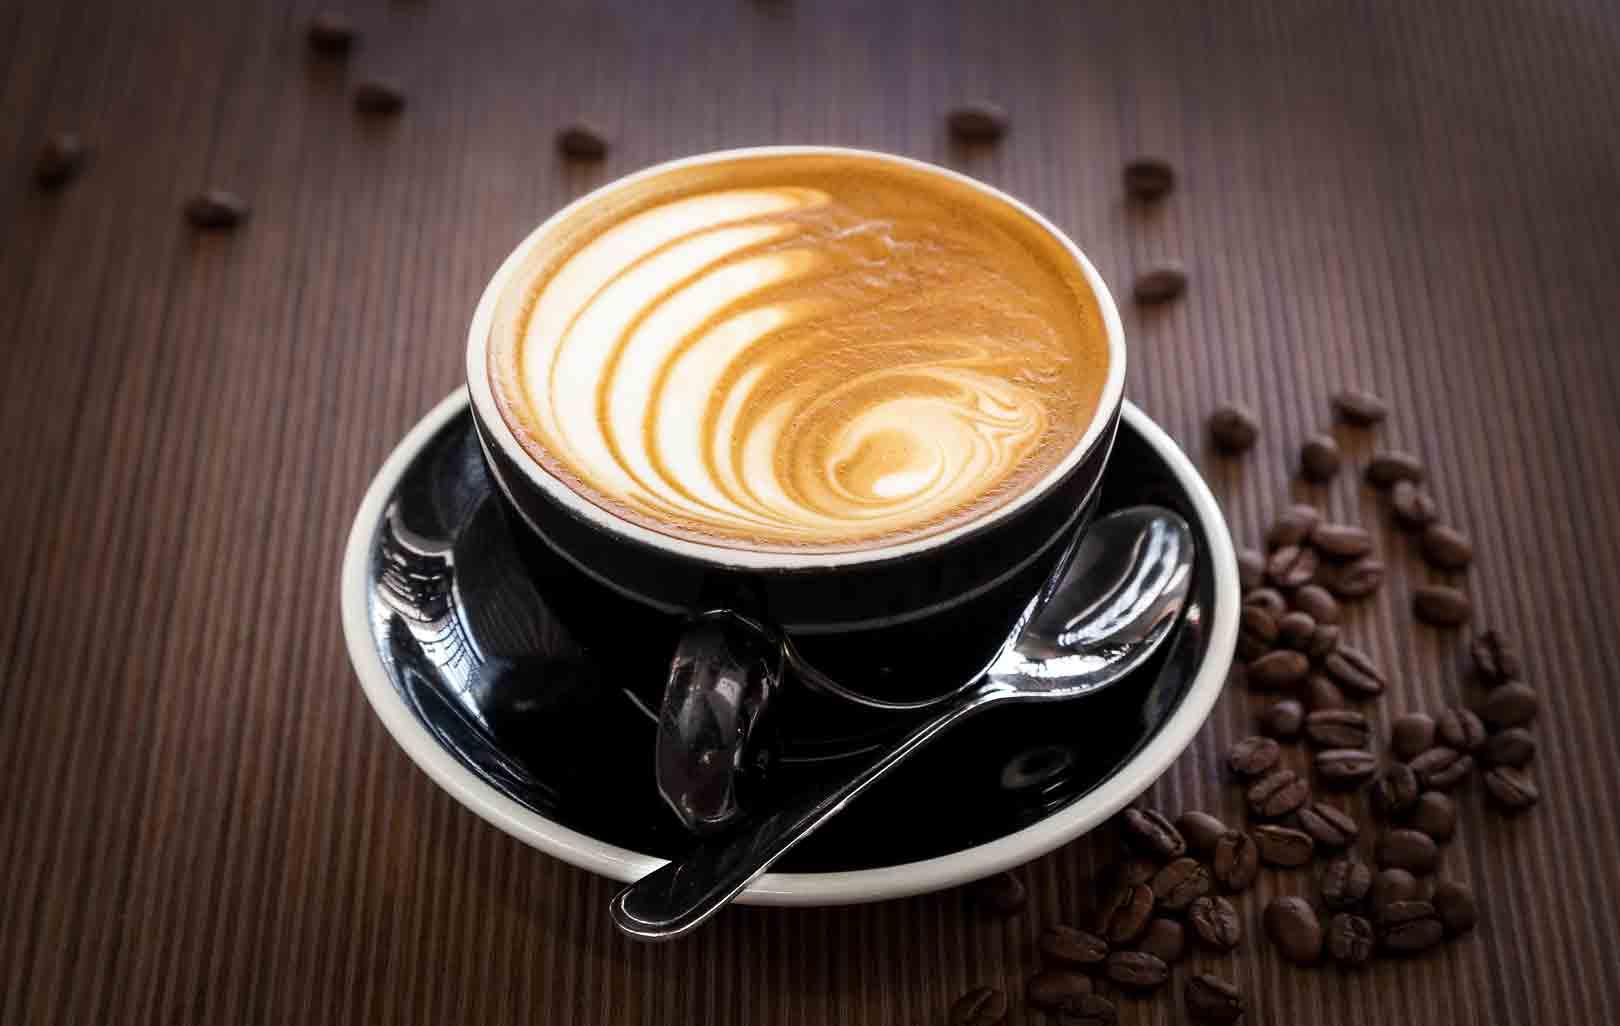 Coffee in a mug